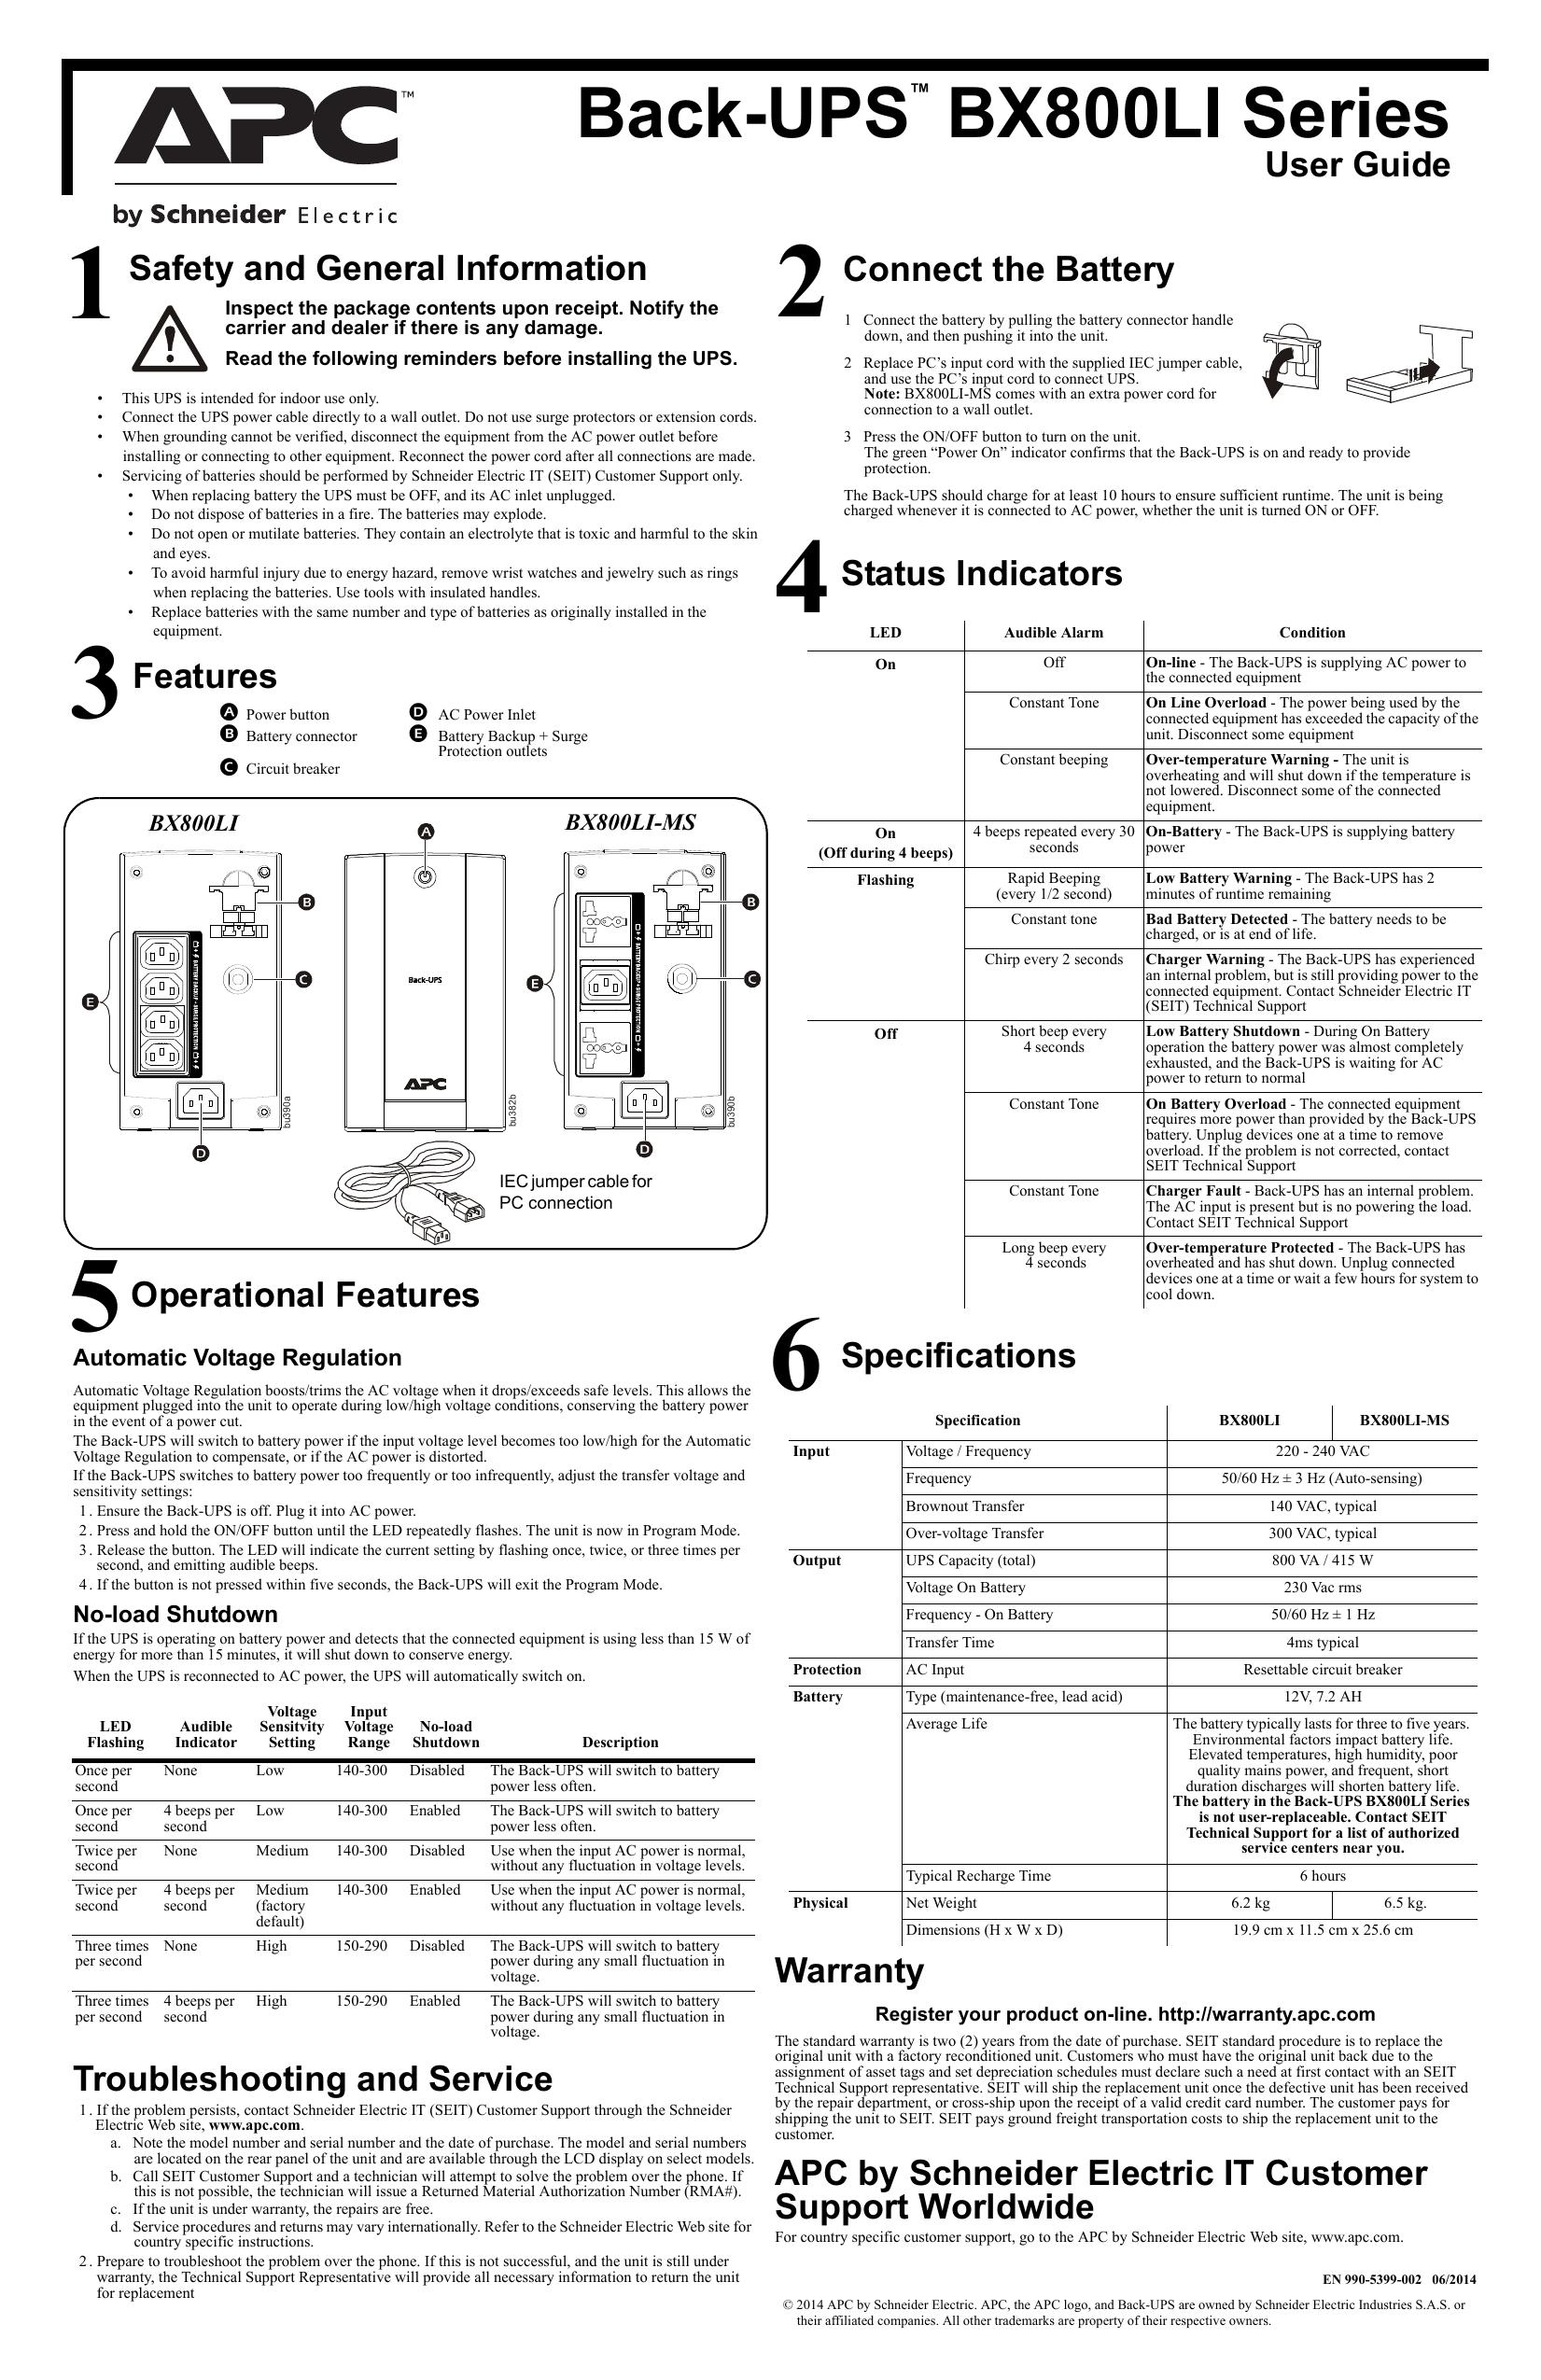 Back-UPS BX800LI Series Safety and General | manualzz com